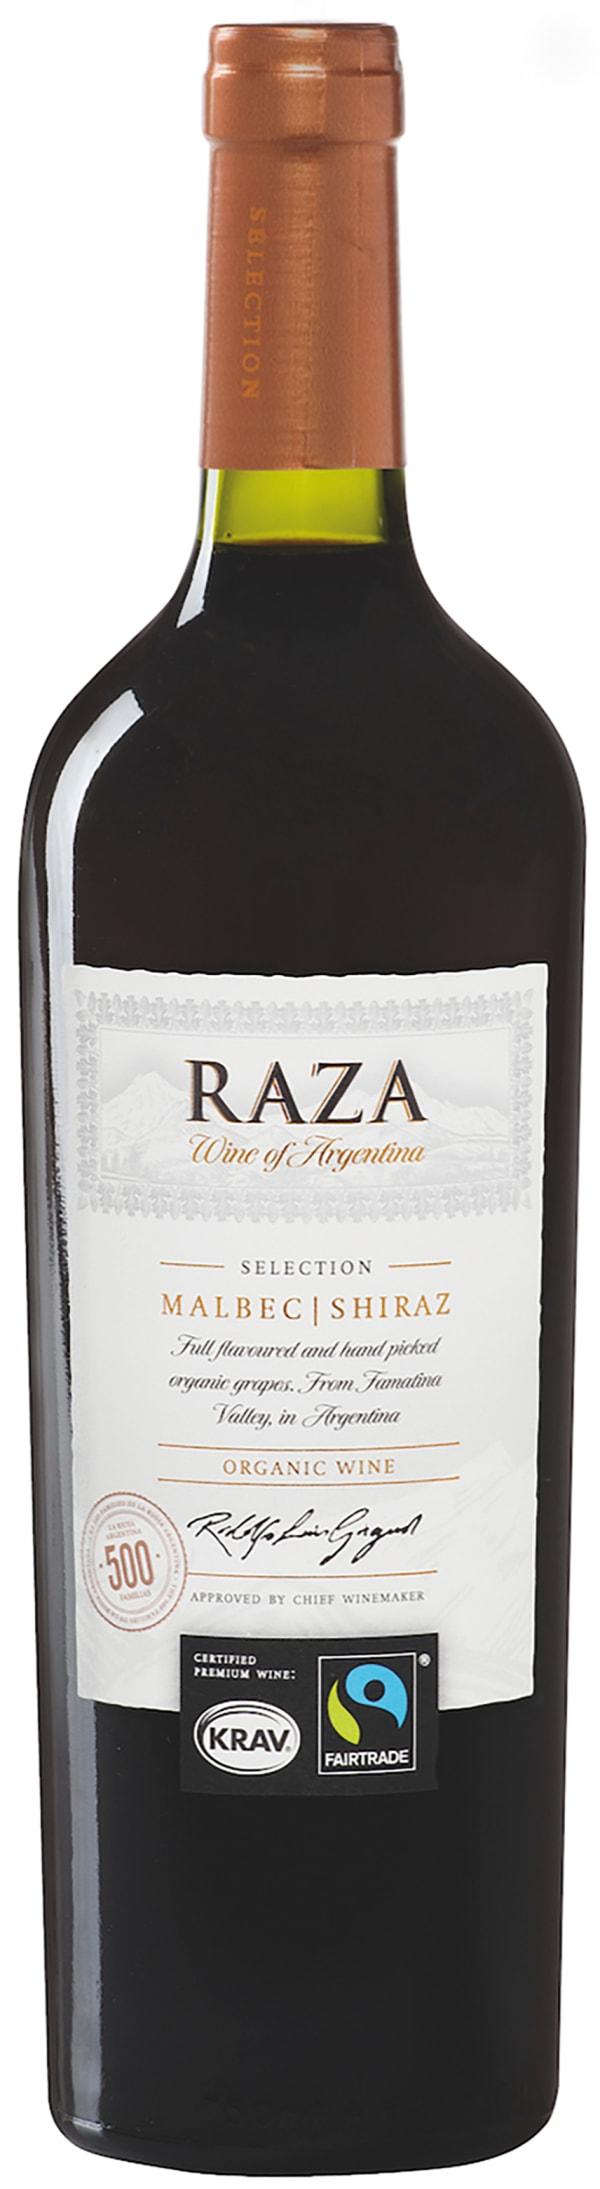 Raza Selection Malbec Shiraz Organic 2015